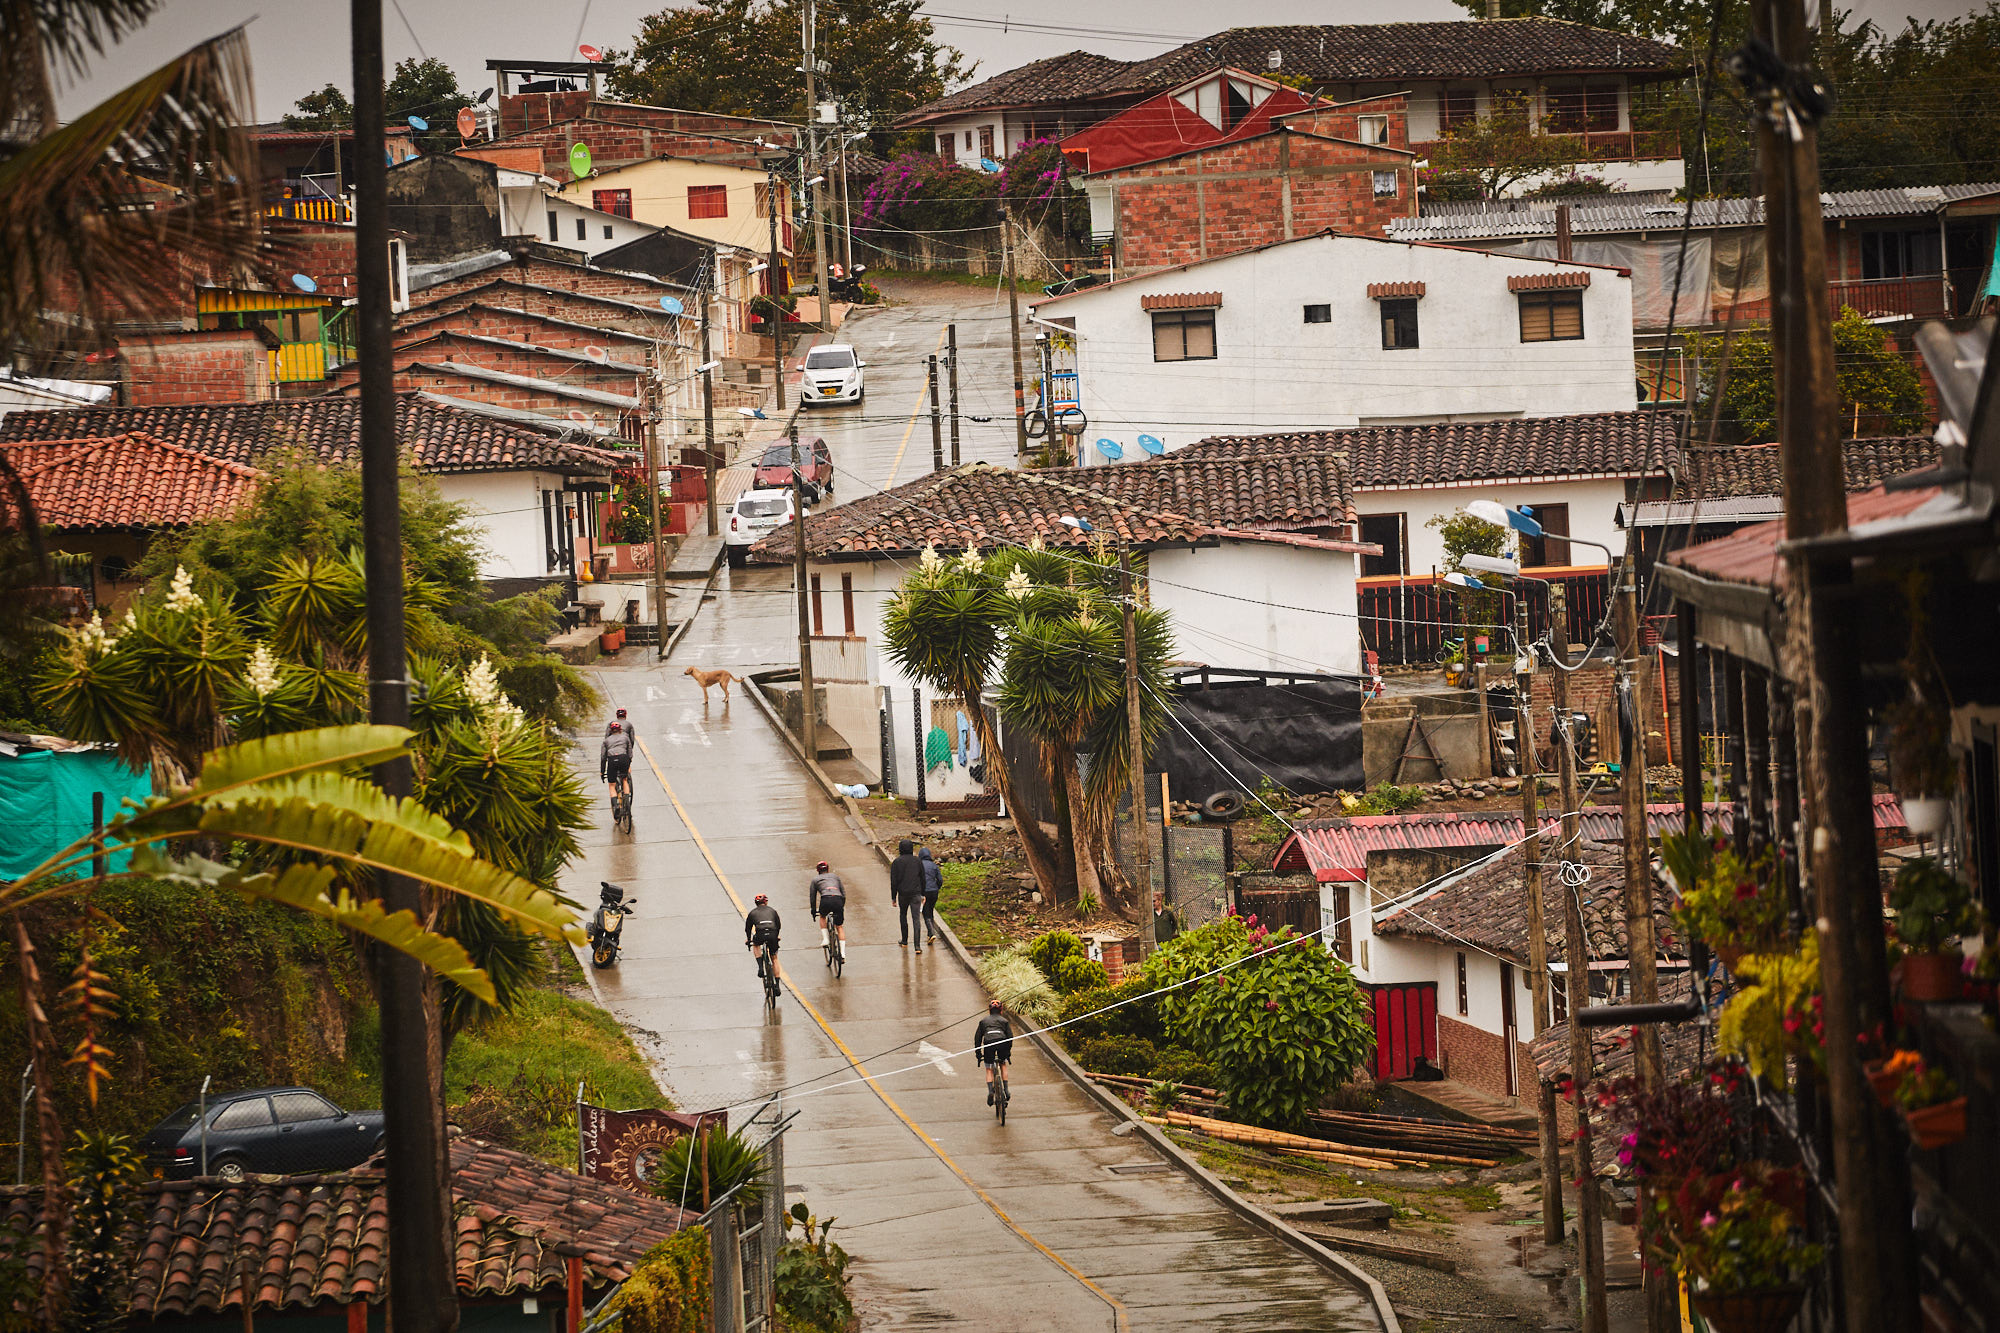 LOWRES-RADRACE-COLUMBIA-2018-CARLOS-2769.jpg